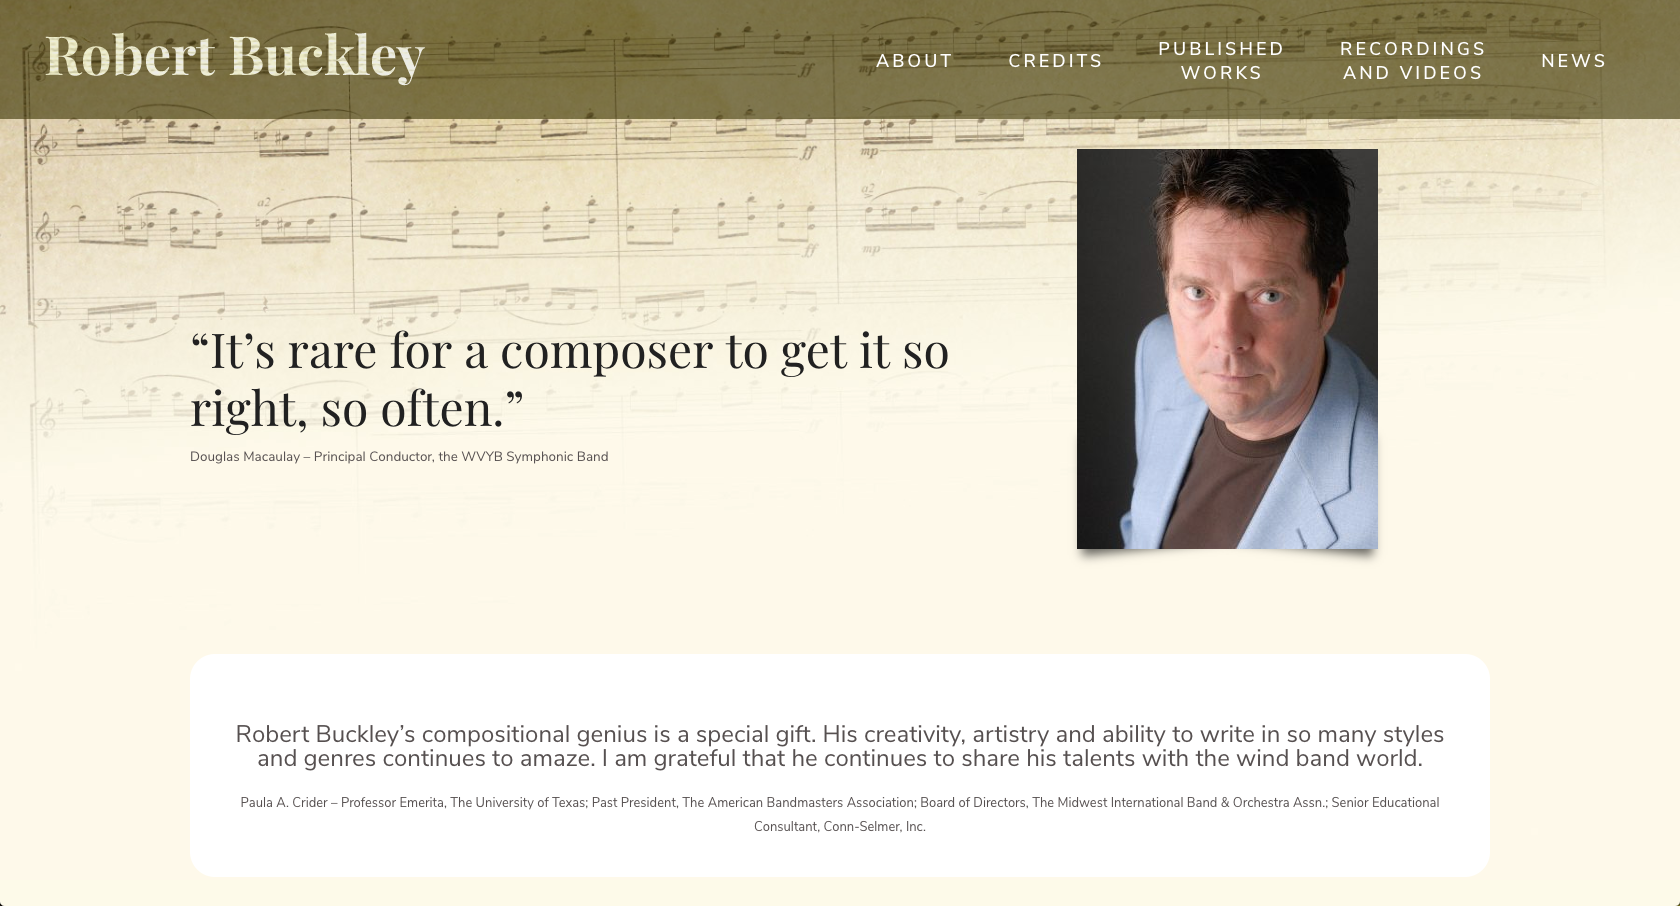 Bob Buckley website